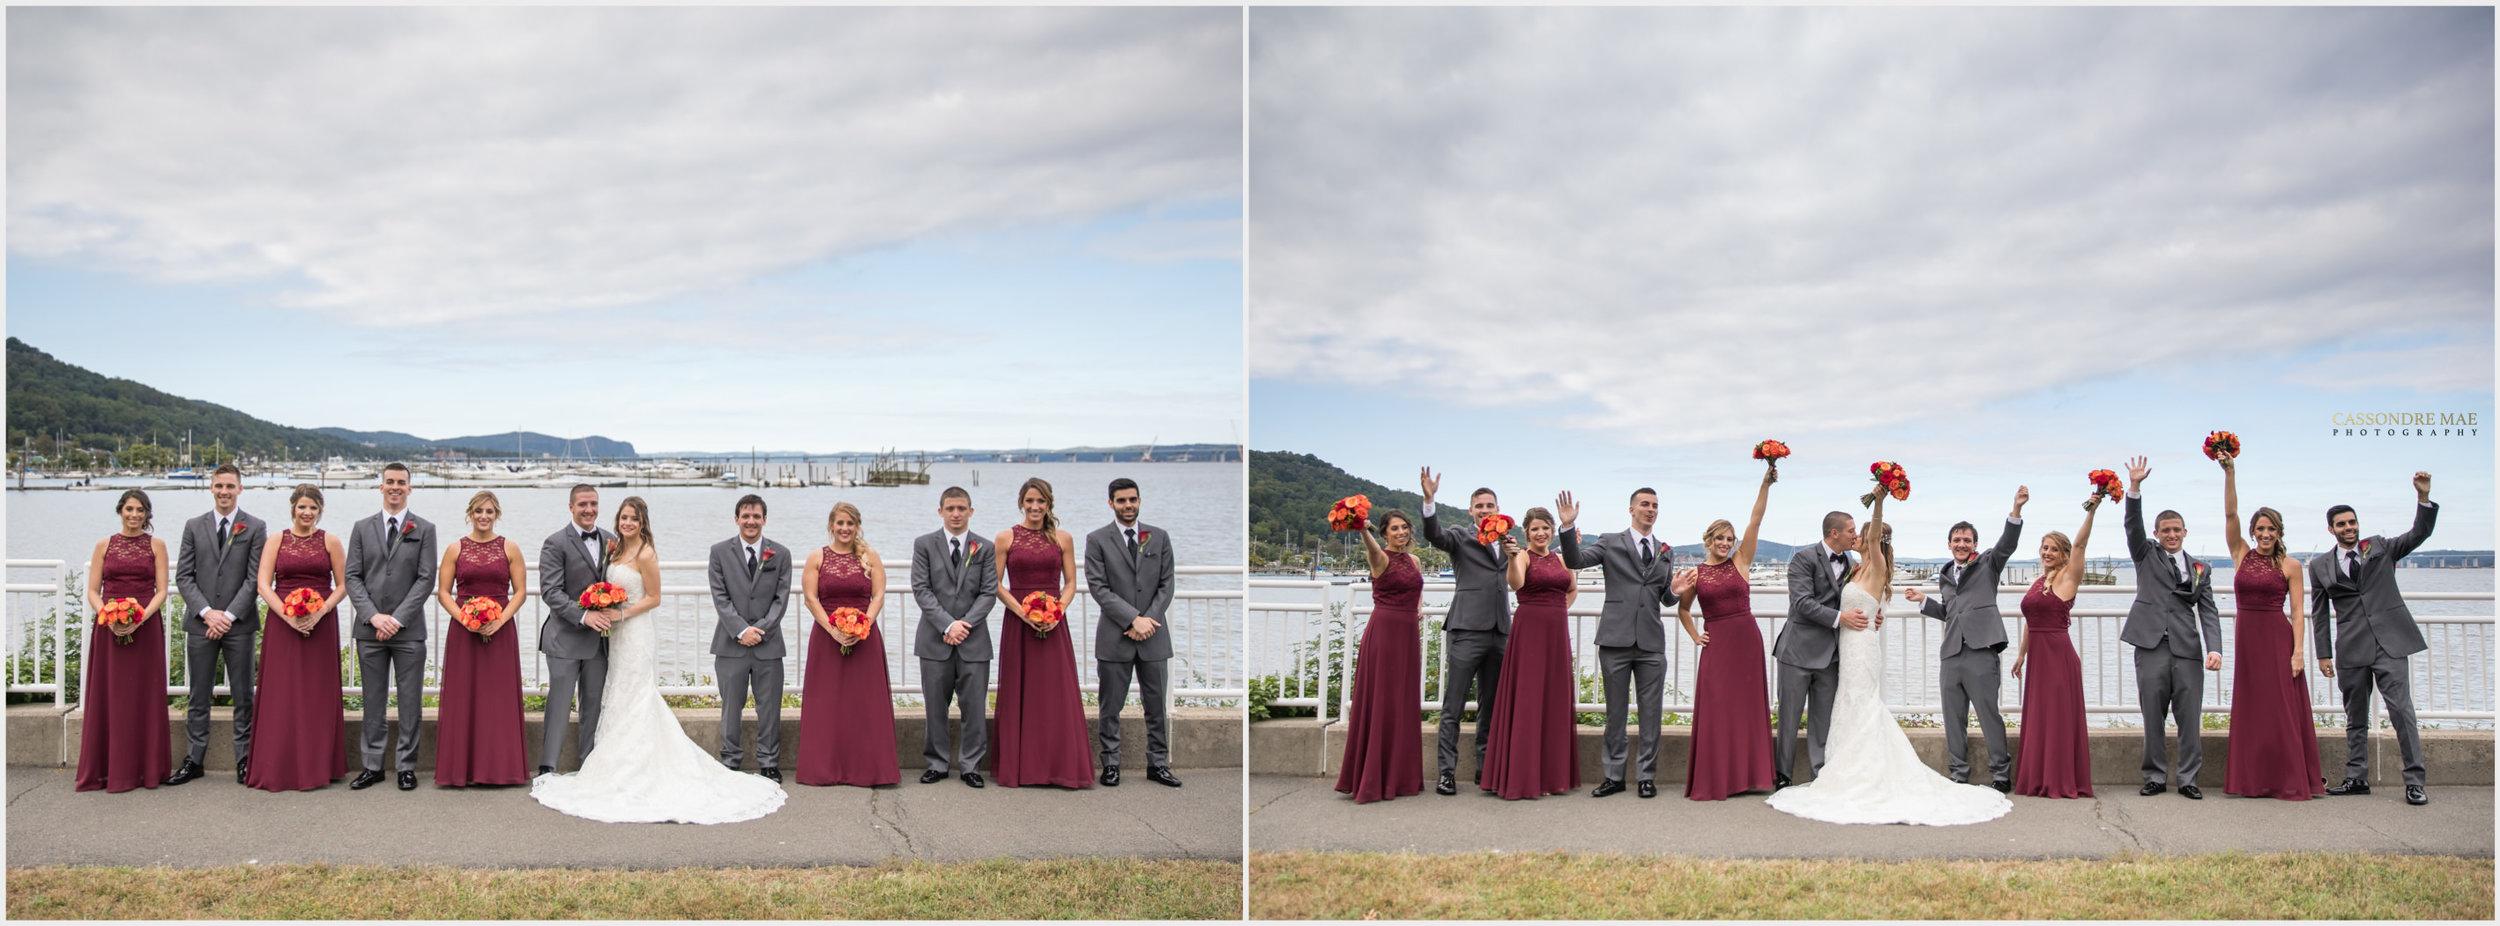 Views on the Hudson Wedding Photos Cassondre Mae Photography 30.jpg